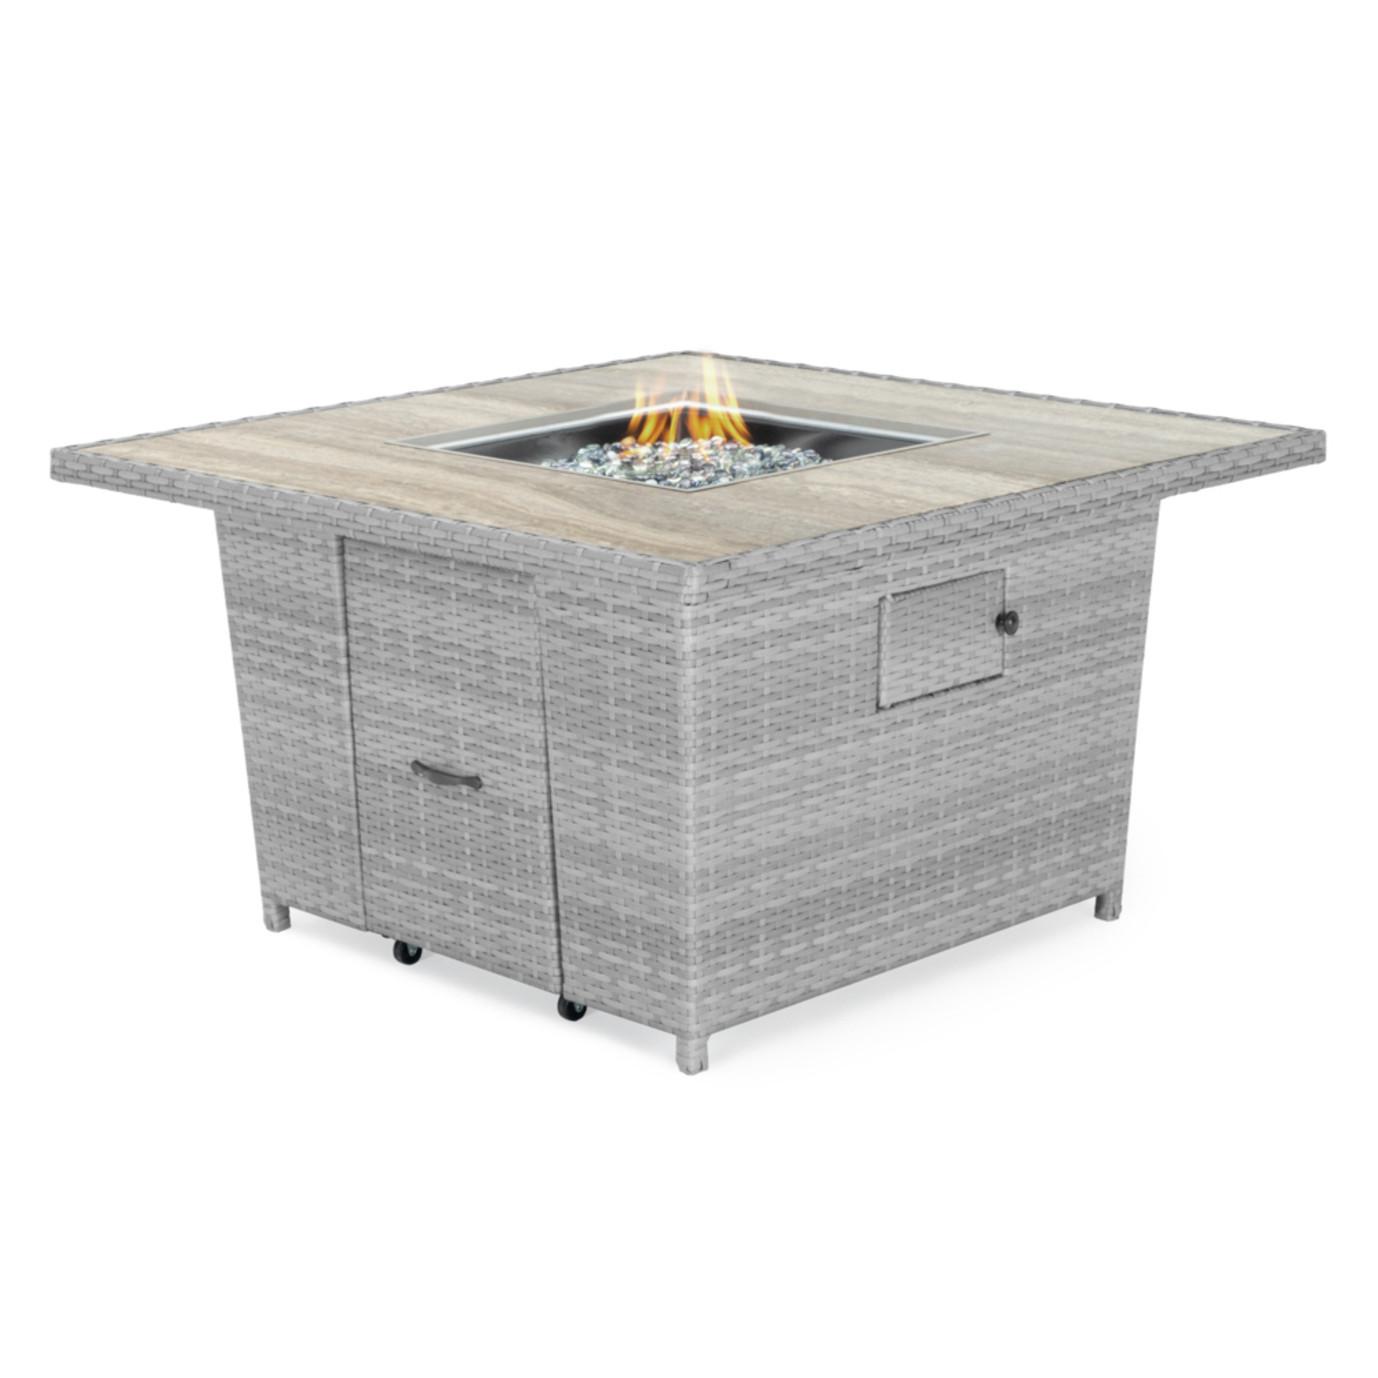 Portofino® Comfort 5 Piece Fire Chat Set - Laguna Blue